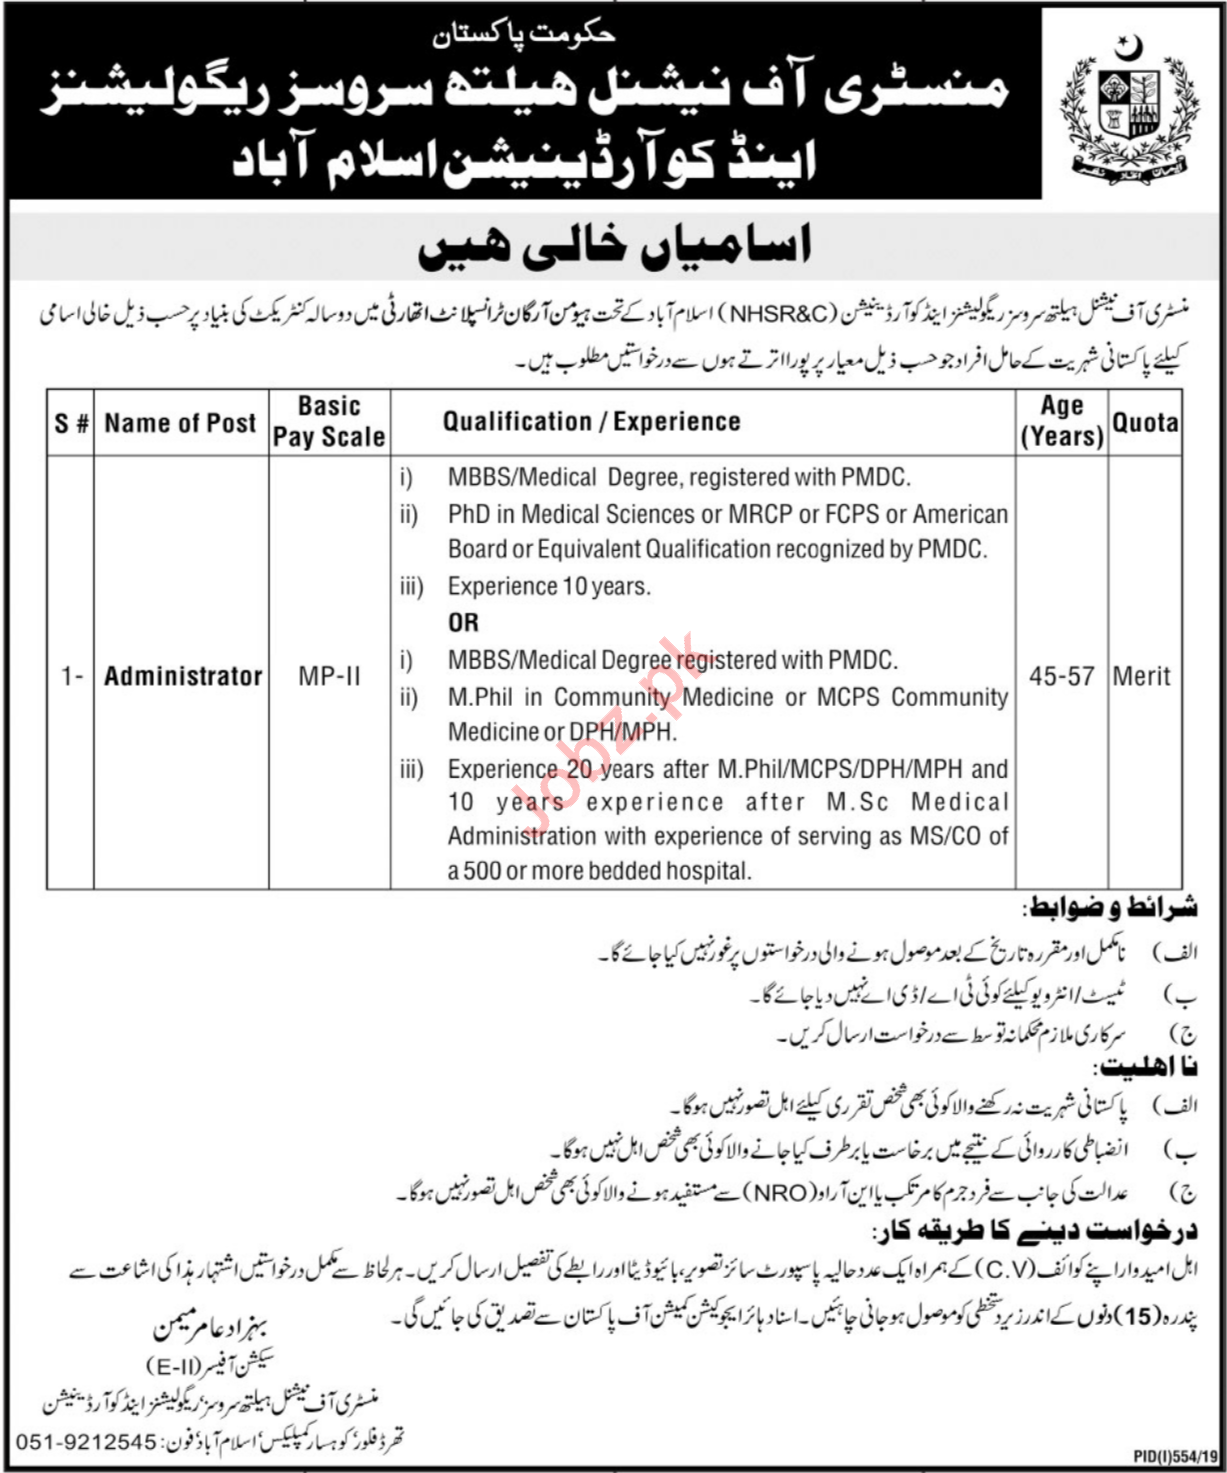 Ministry Of National Health Srv Reg & Coordination Jobs 2019